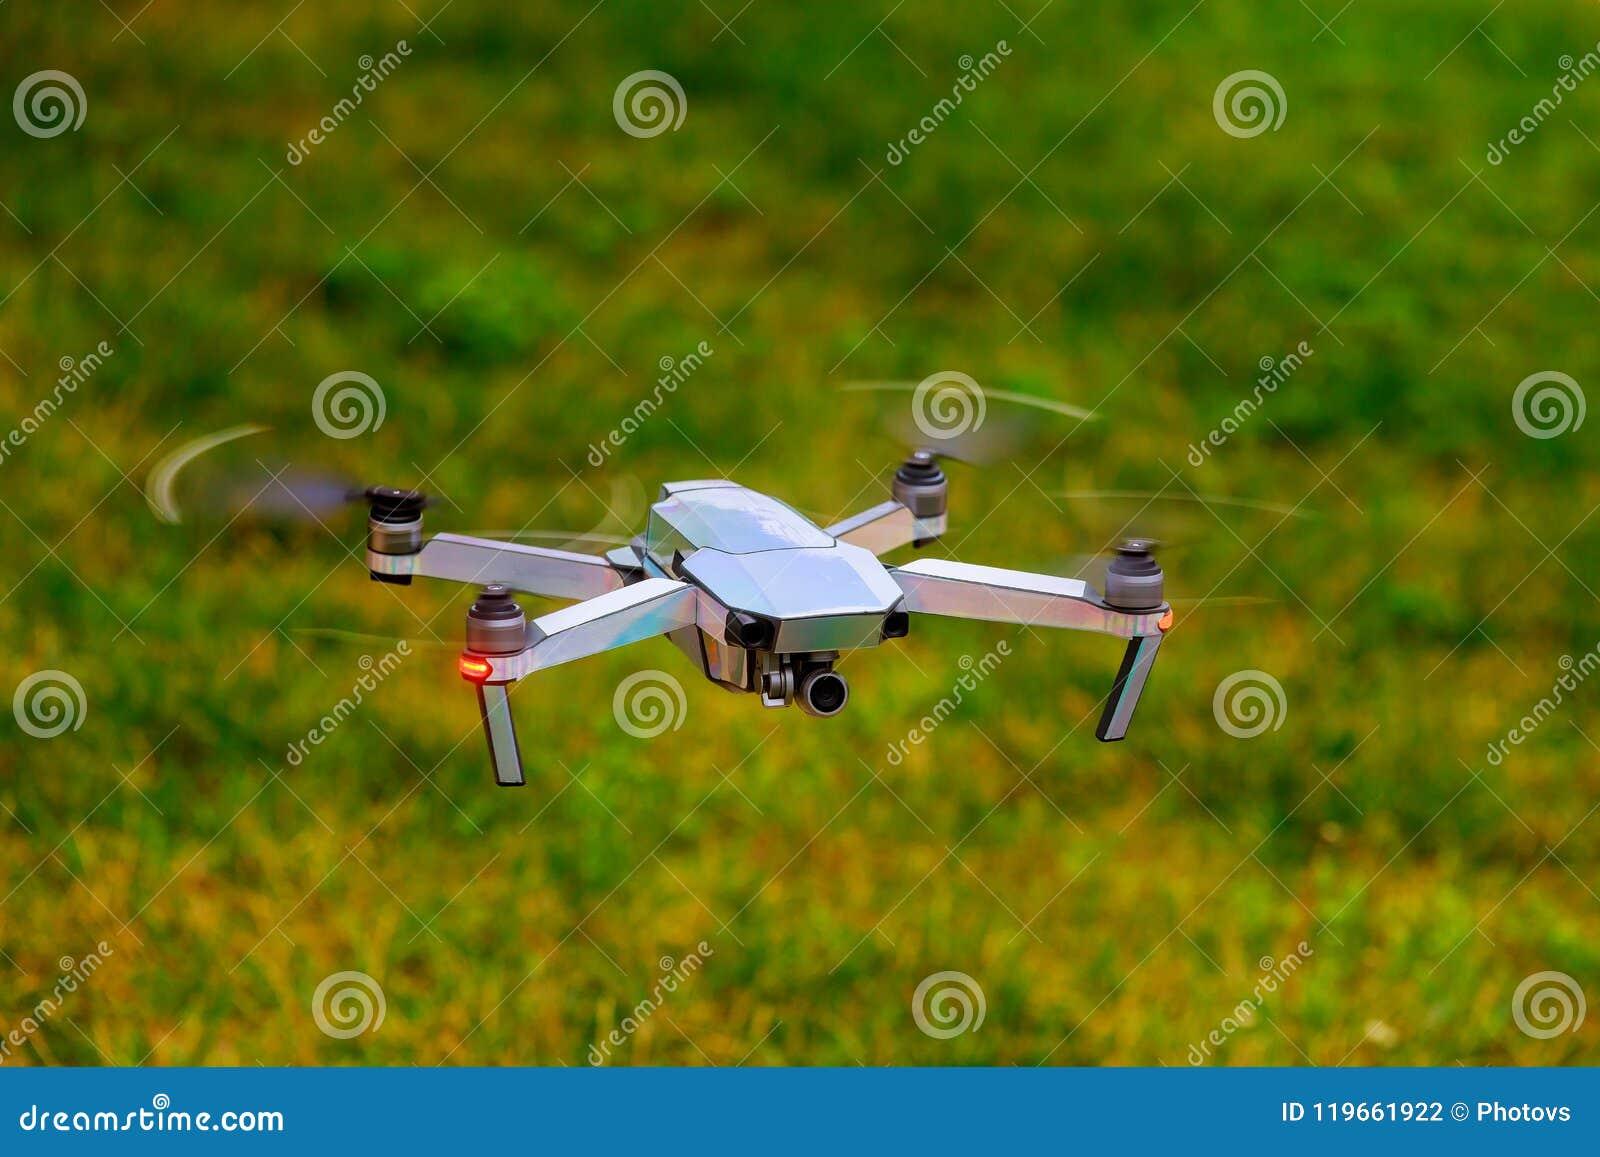 drone radar